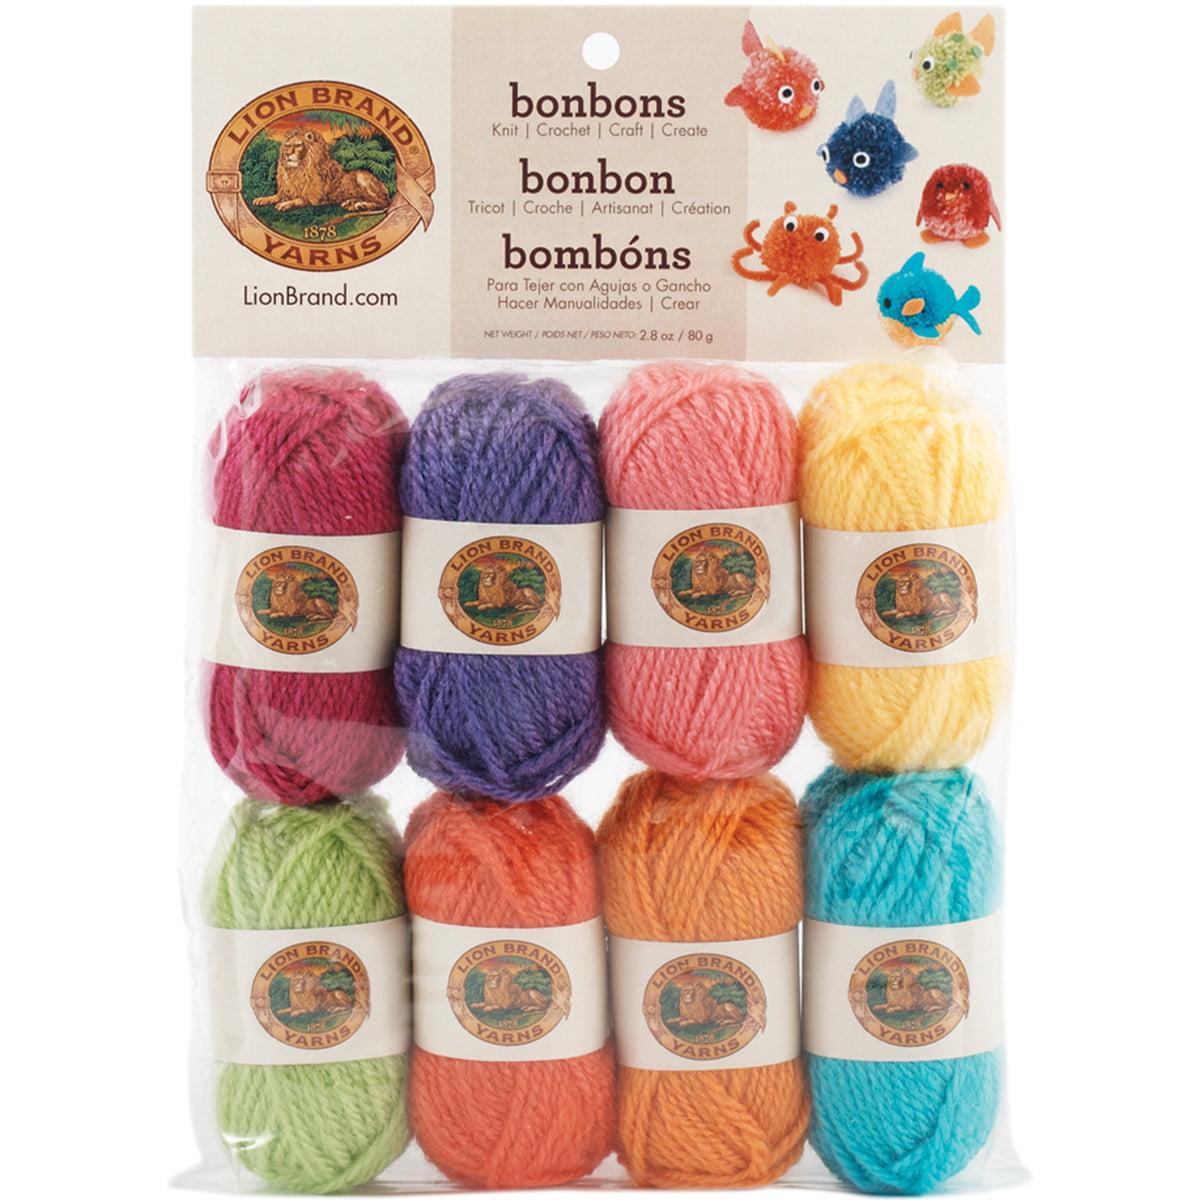 Bonbons Yarn 8/Pkg-Brights - image 1 de 2